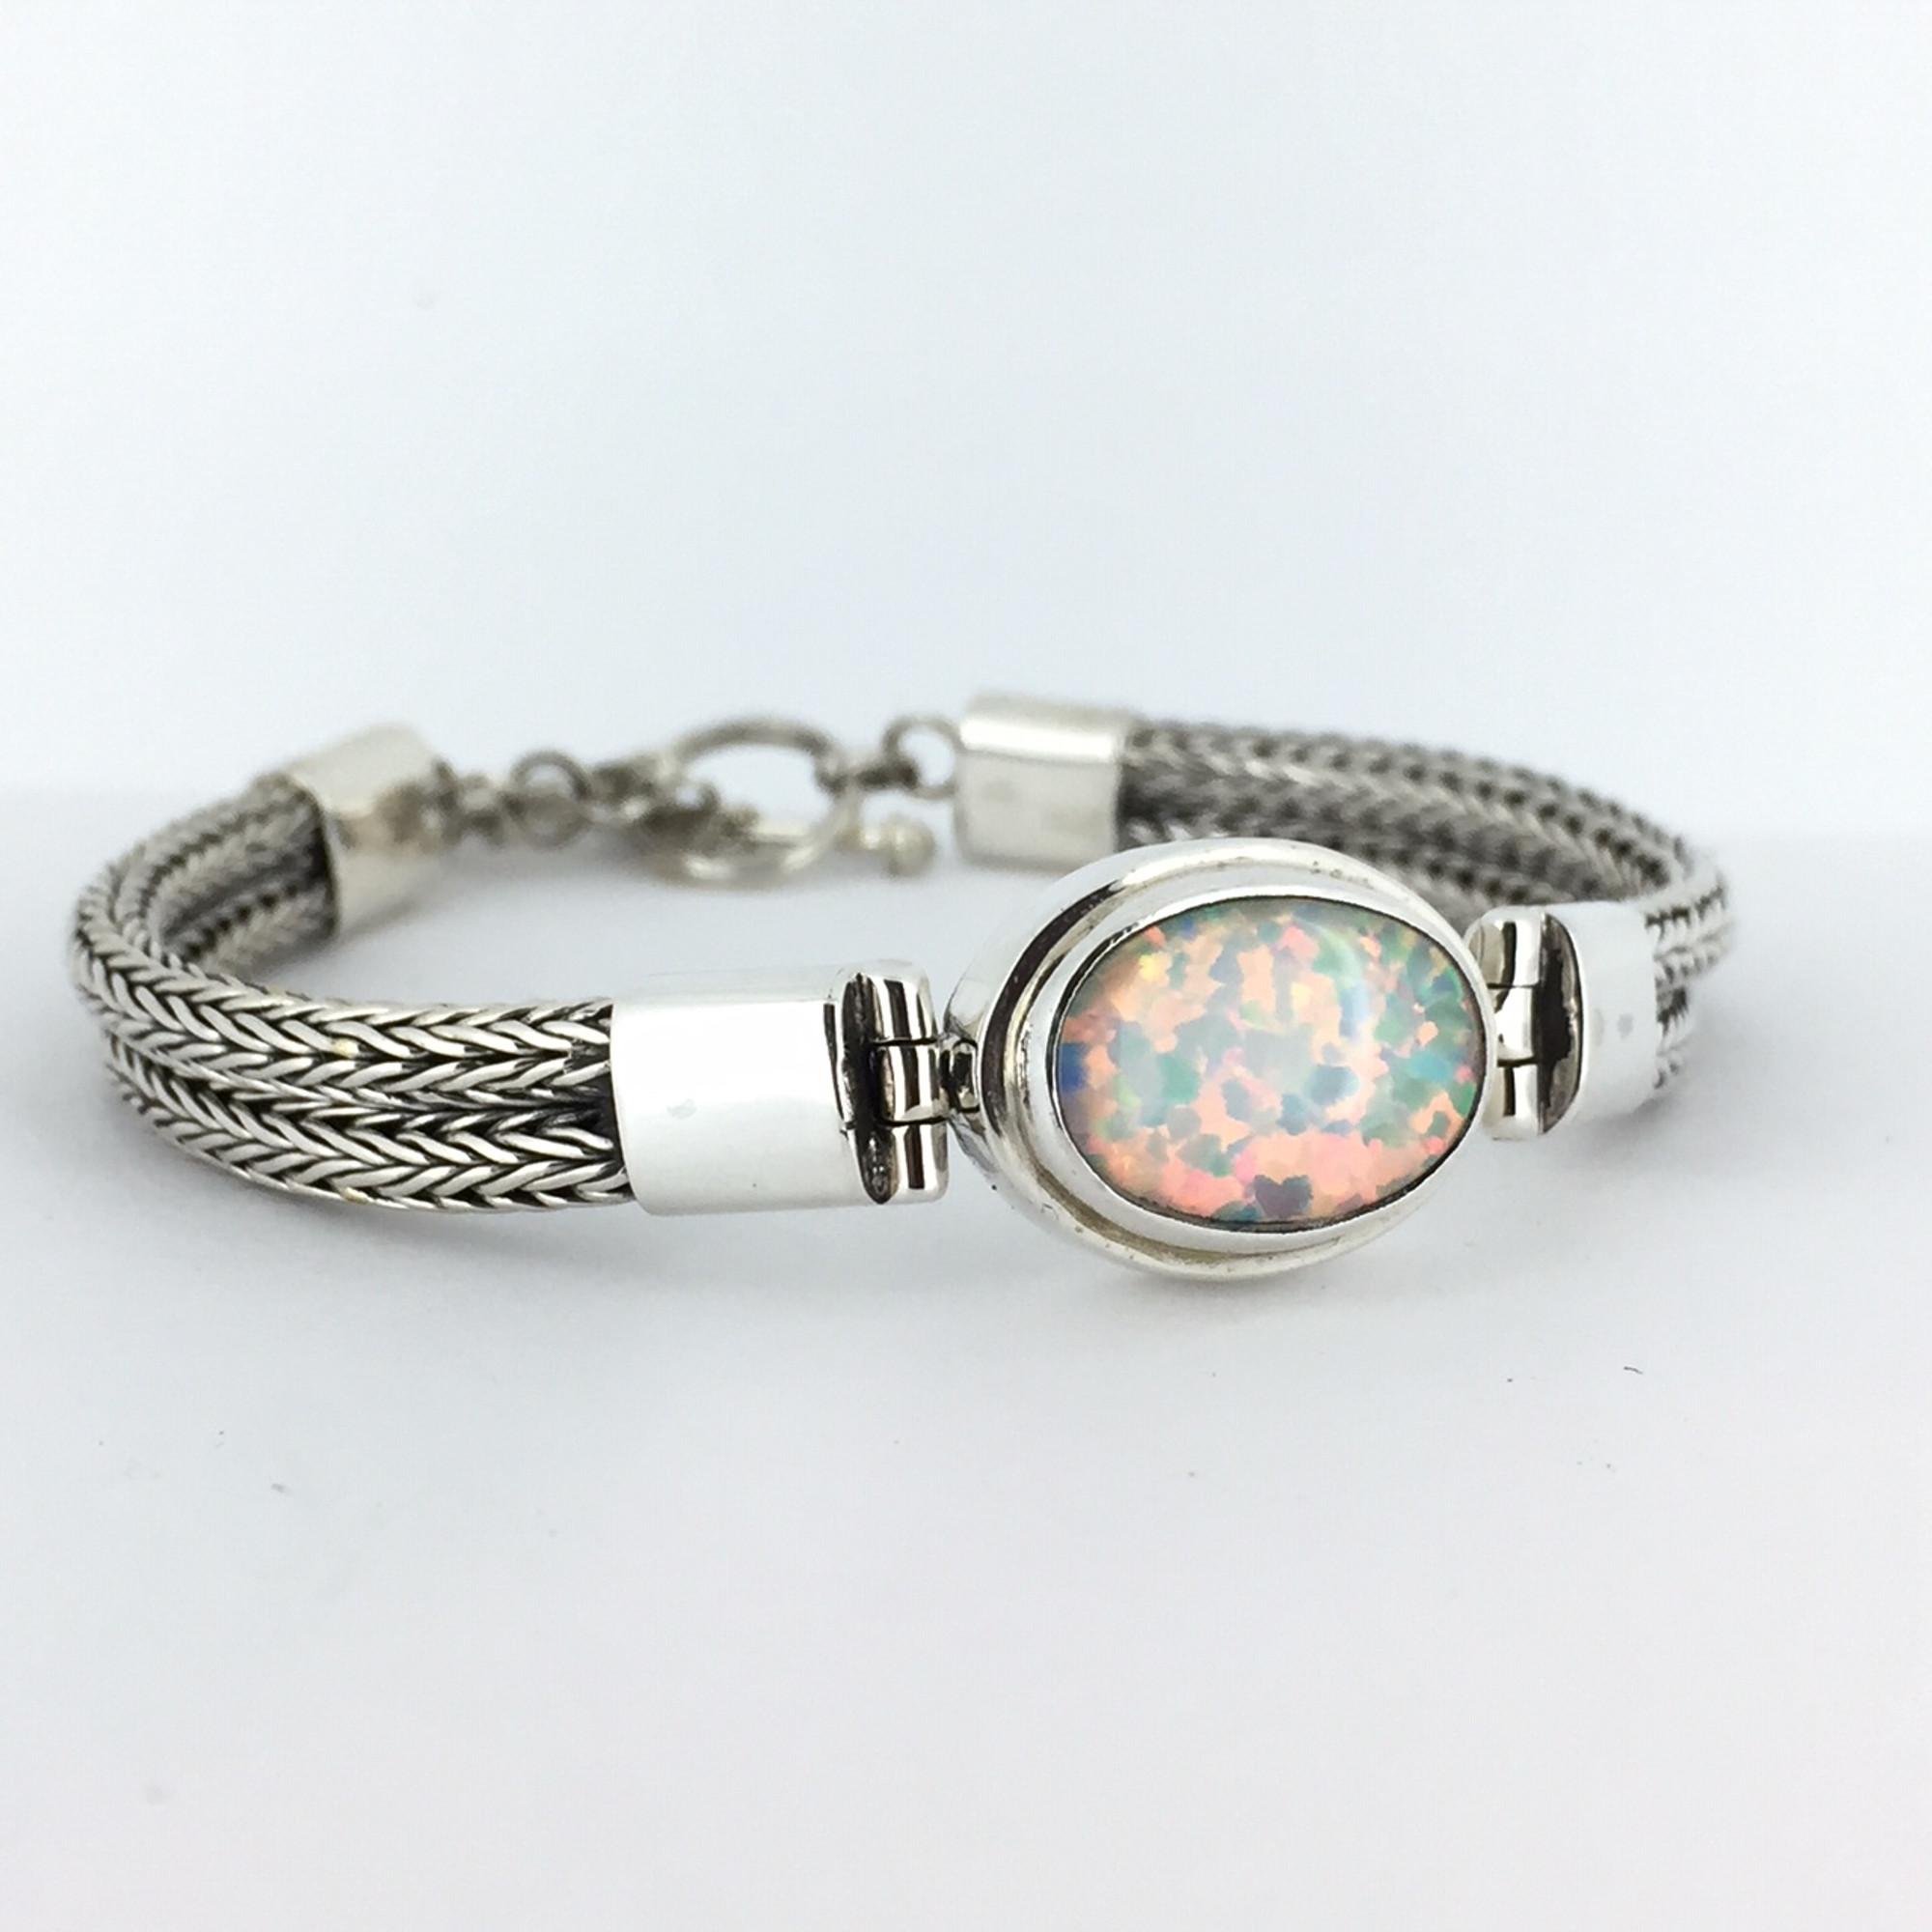 2204eb2e9 Sterling Silver White Opal Bali Toggle Bracelet - Mima's Of Warwick, LLC